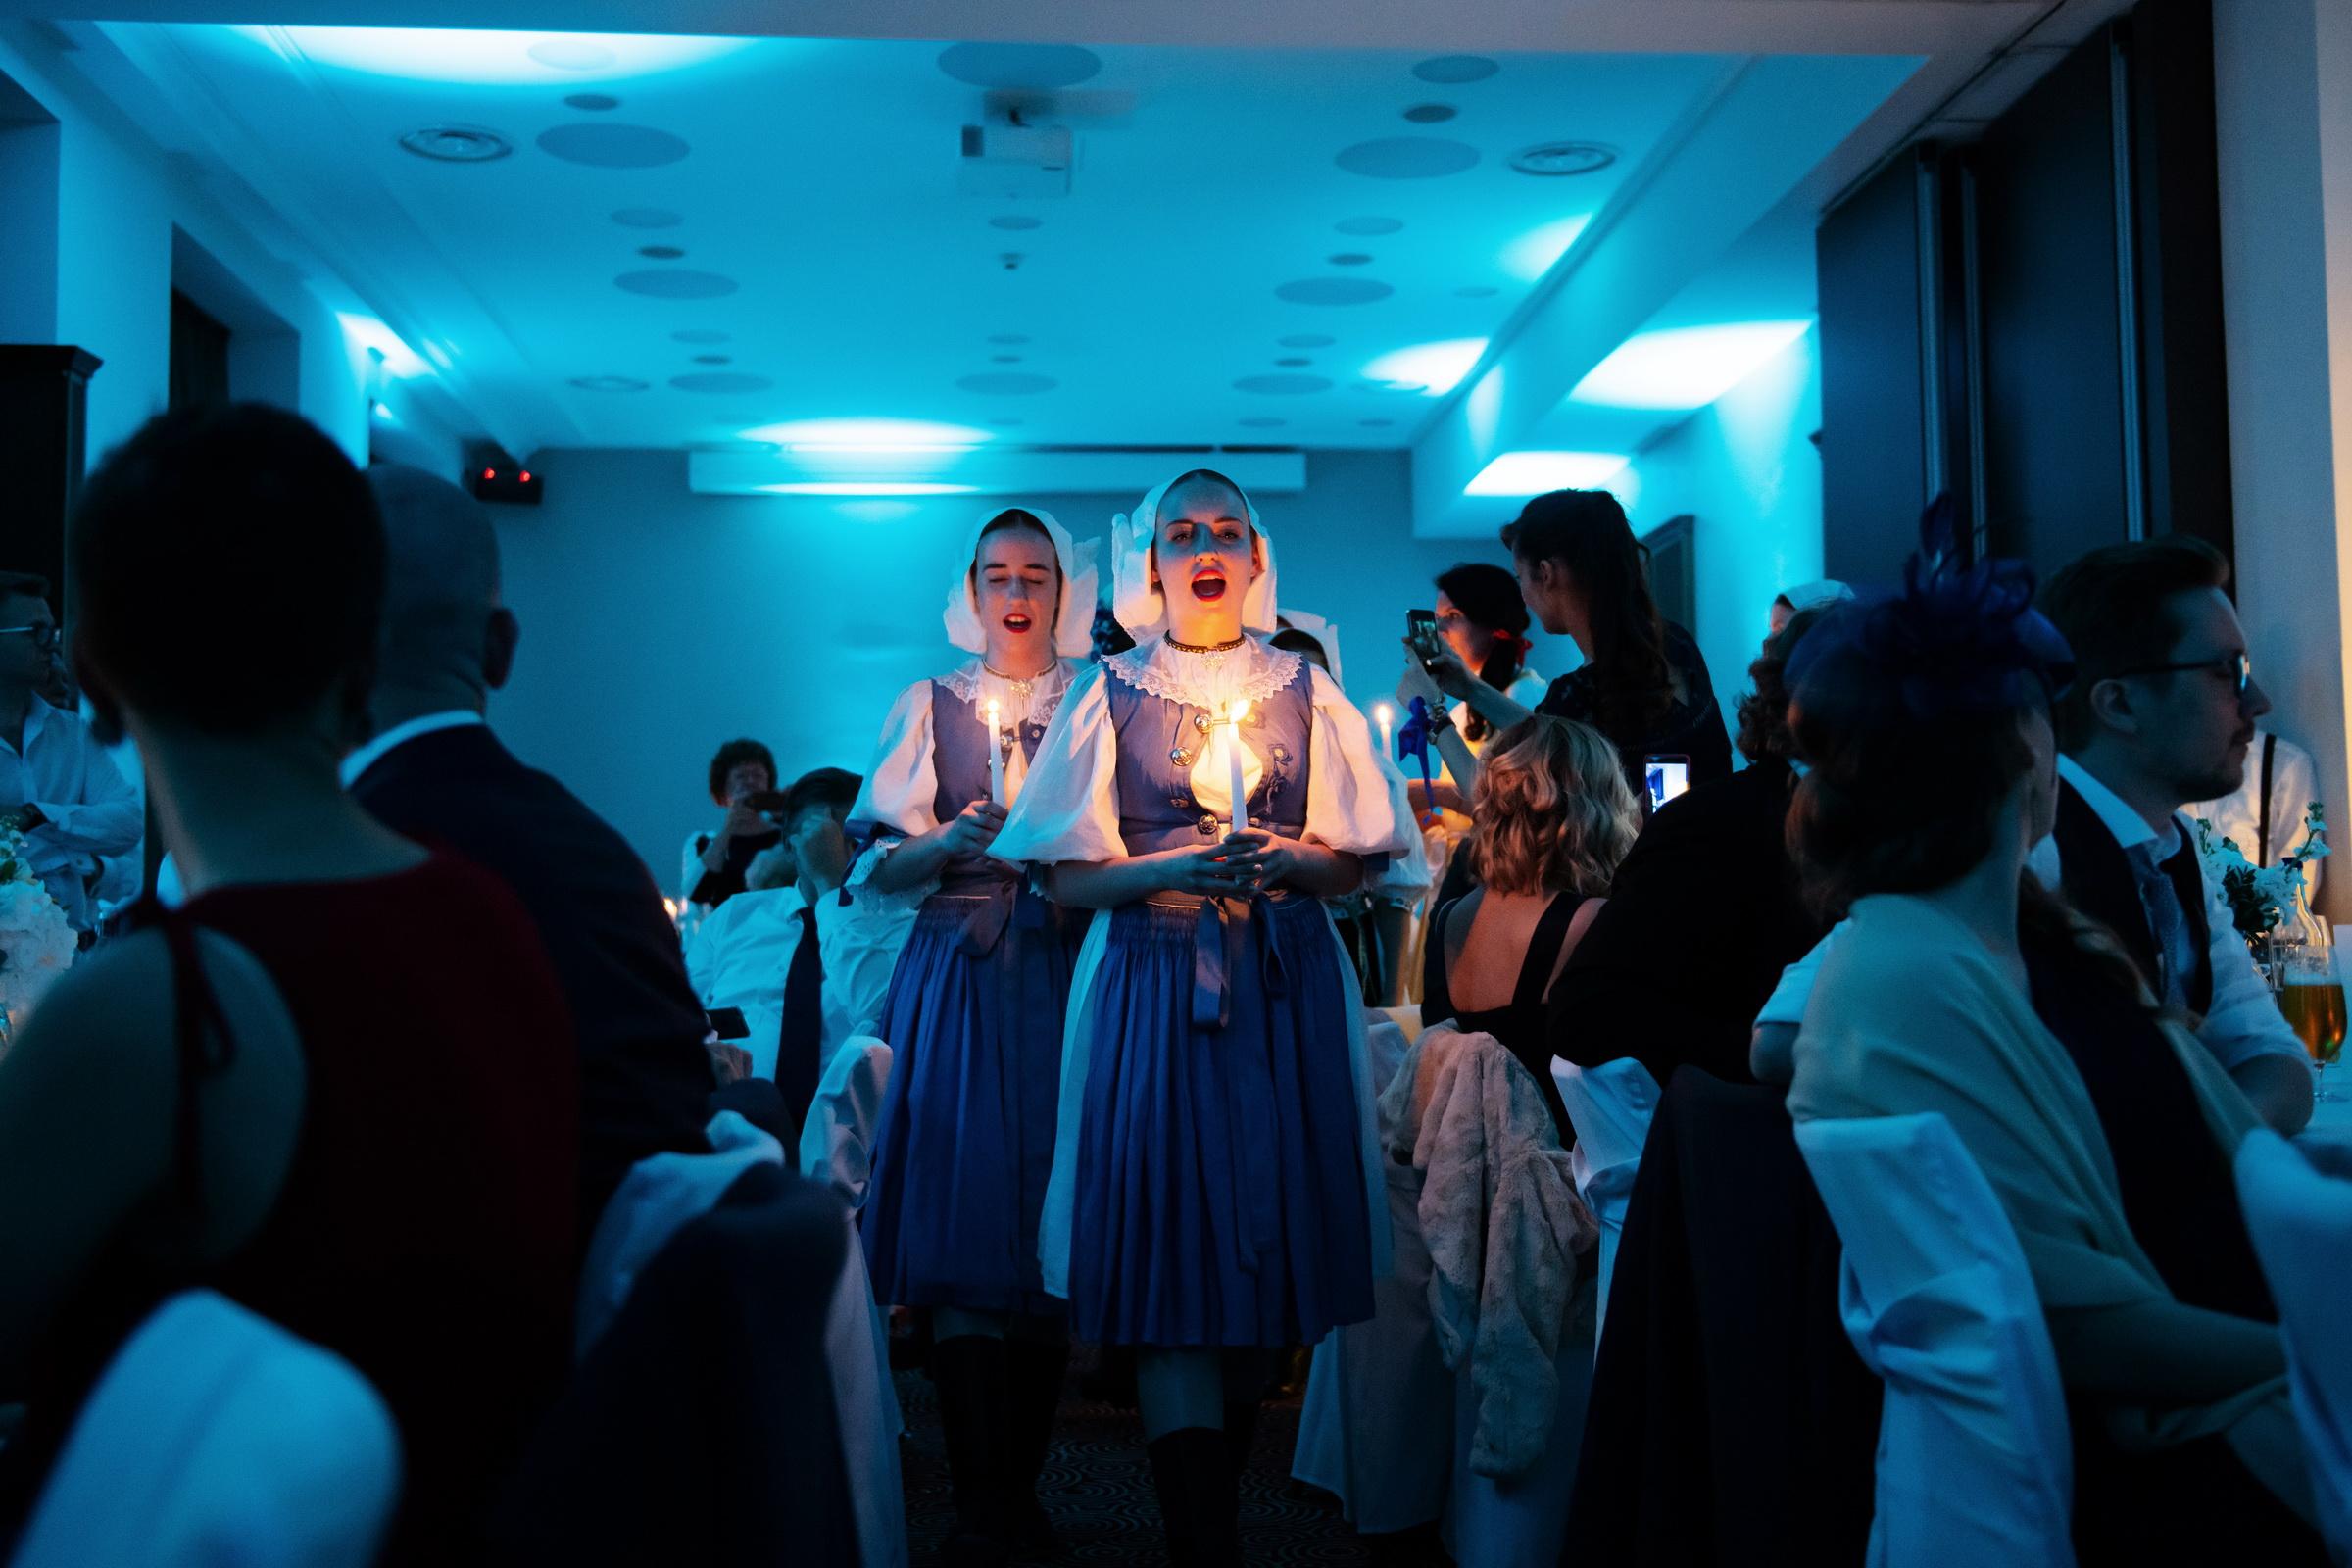 Svadba Hotel Elizabeth, Trenčín 03, #svadobnyDJ, #djanasvadbu, #svadba, #hotelelizabeth